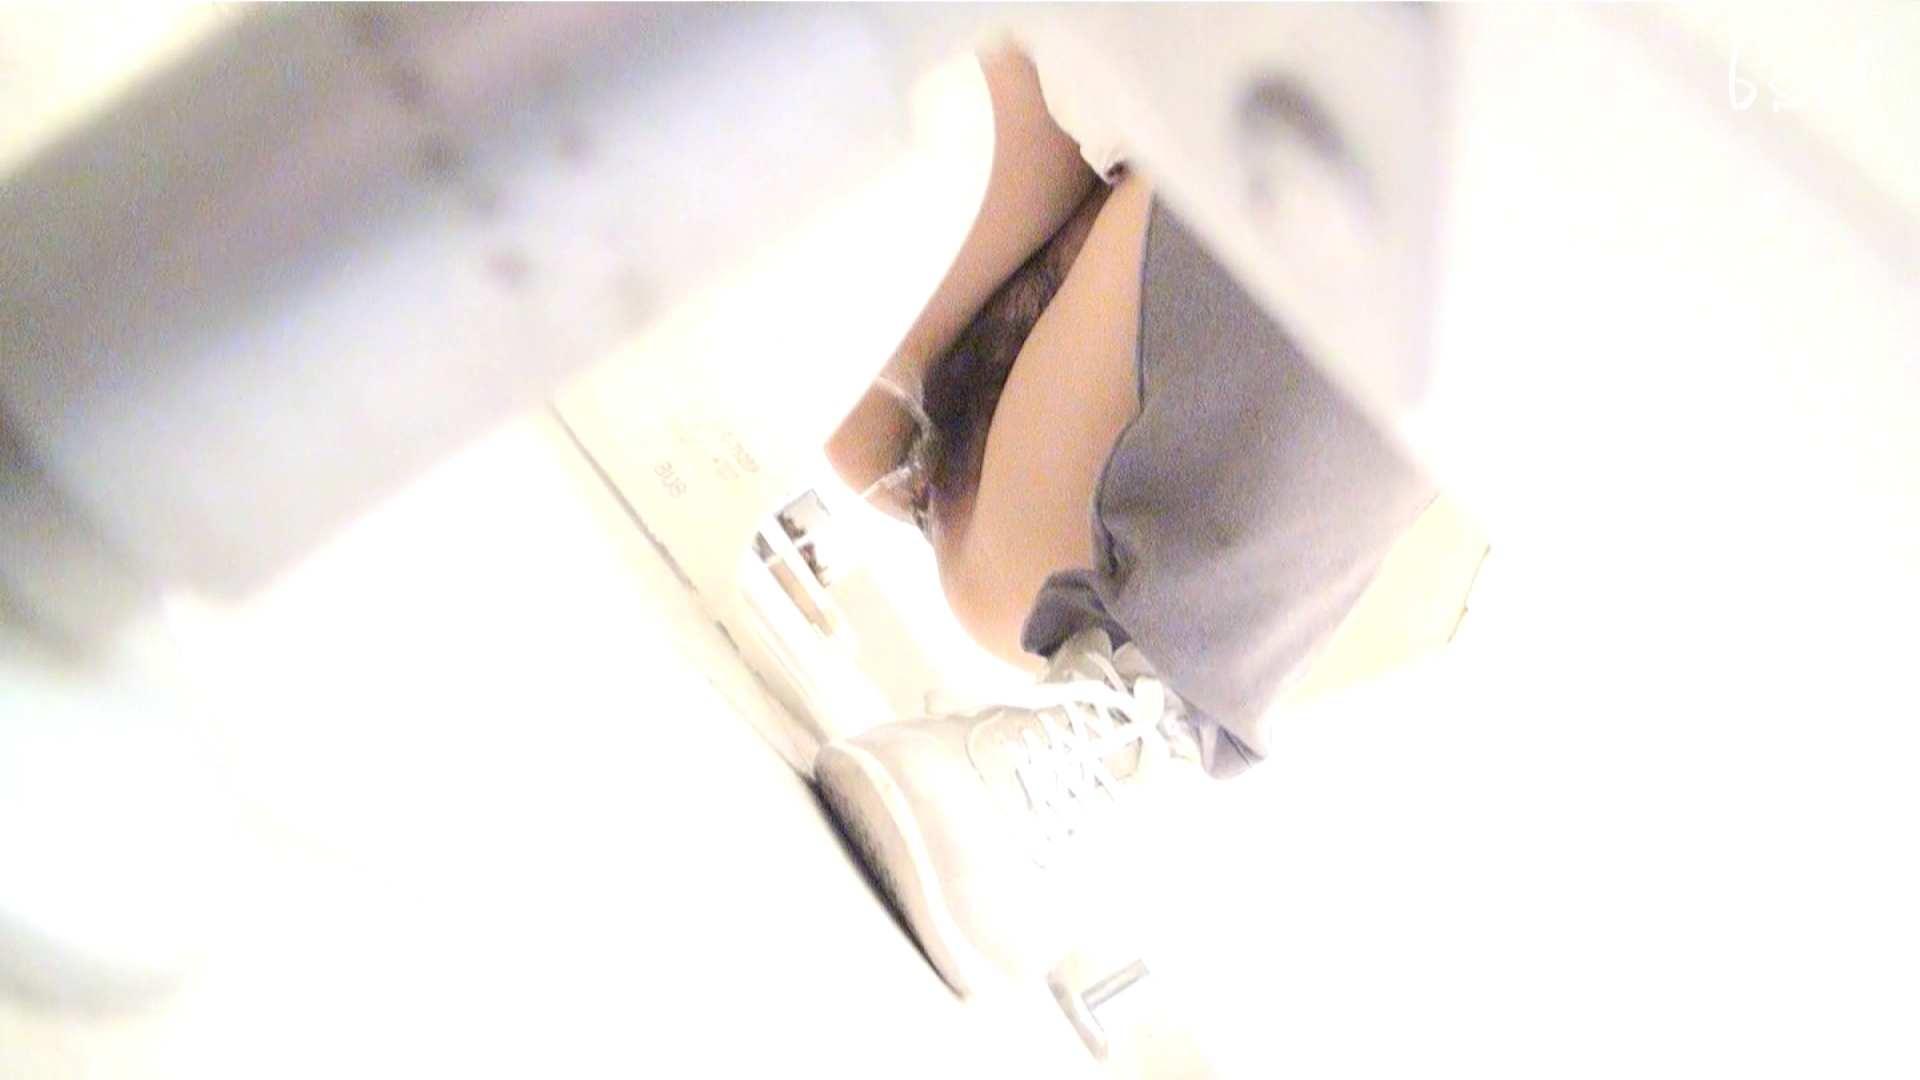 至高下半身盗撮-PREMIUM-【院内病棟編 】VOL1 アラ30  81画像 32